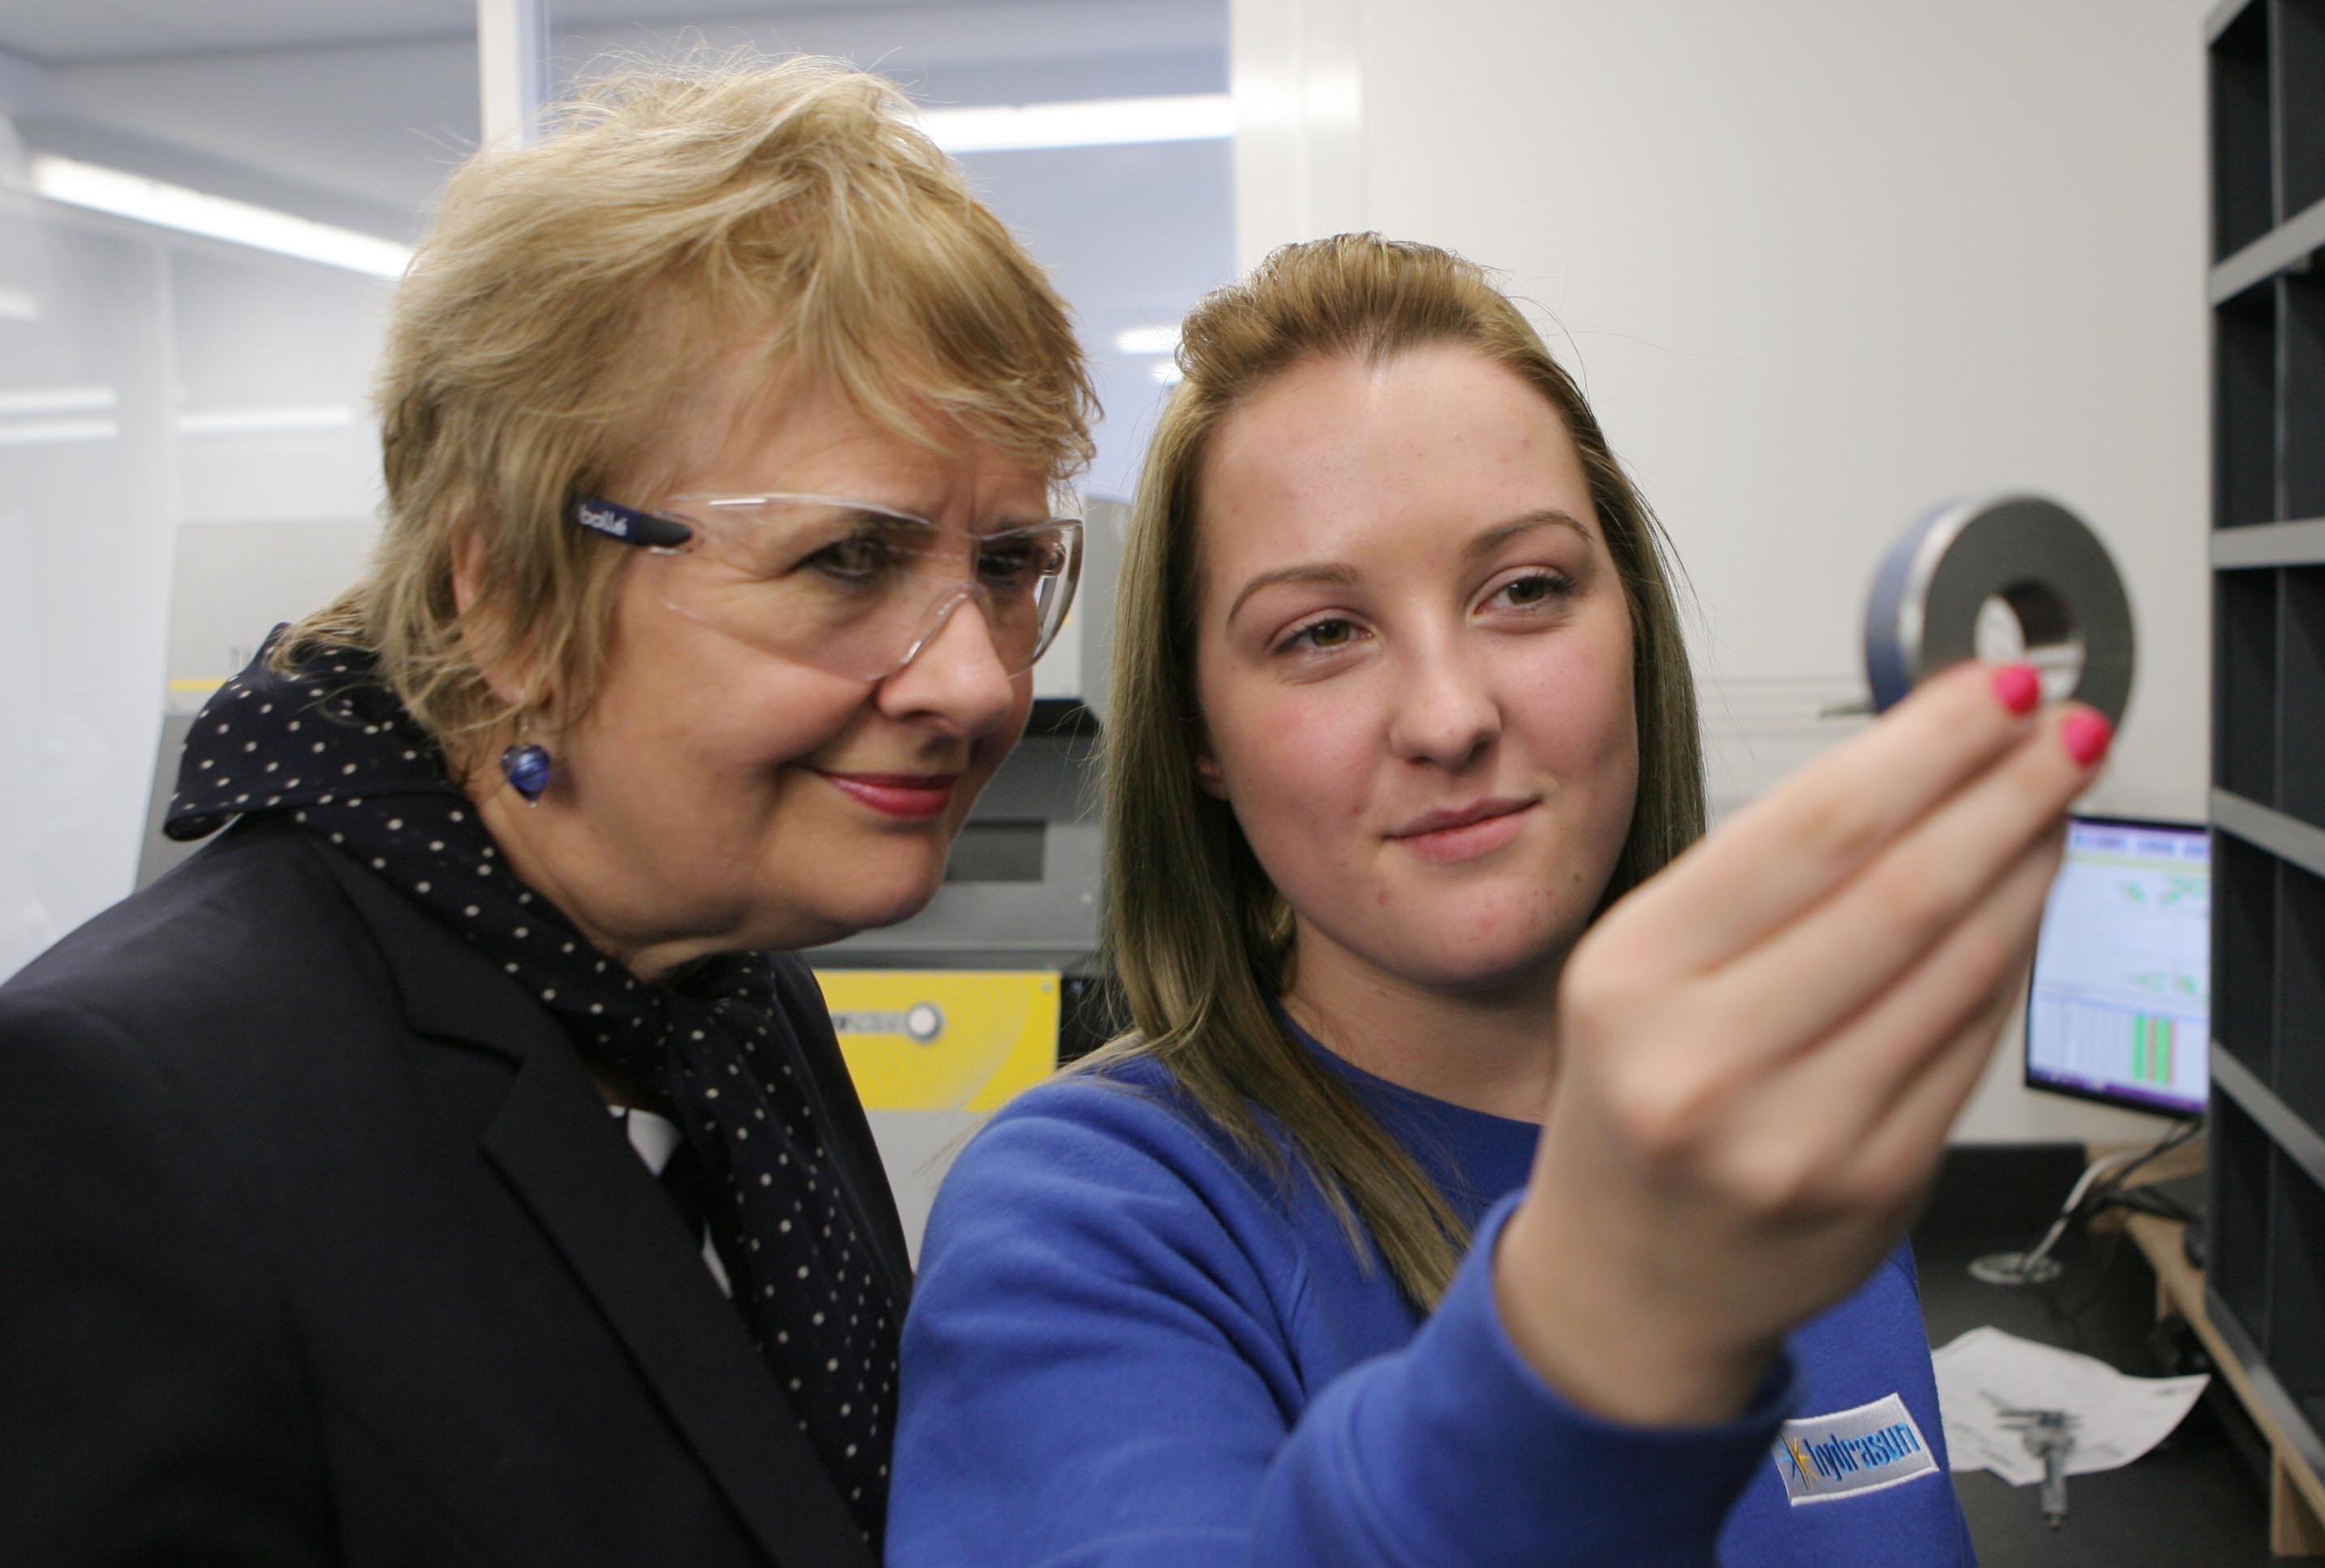 Roseanna Cunningham, left, alongside Hydrasun inspection trainee Megan Grant